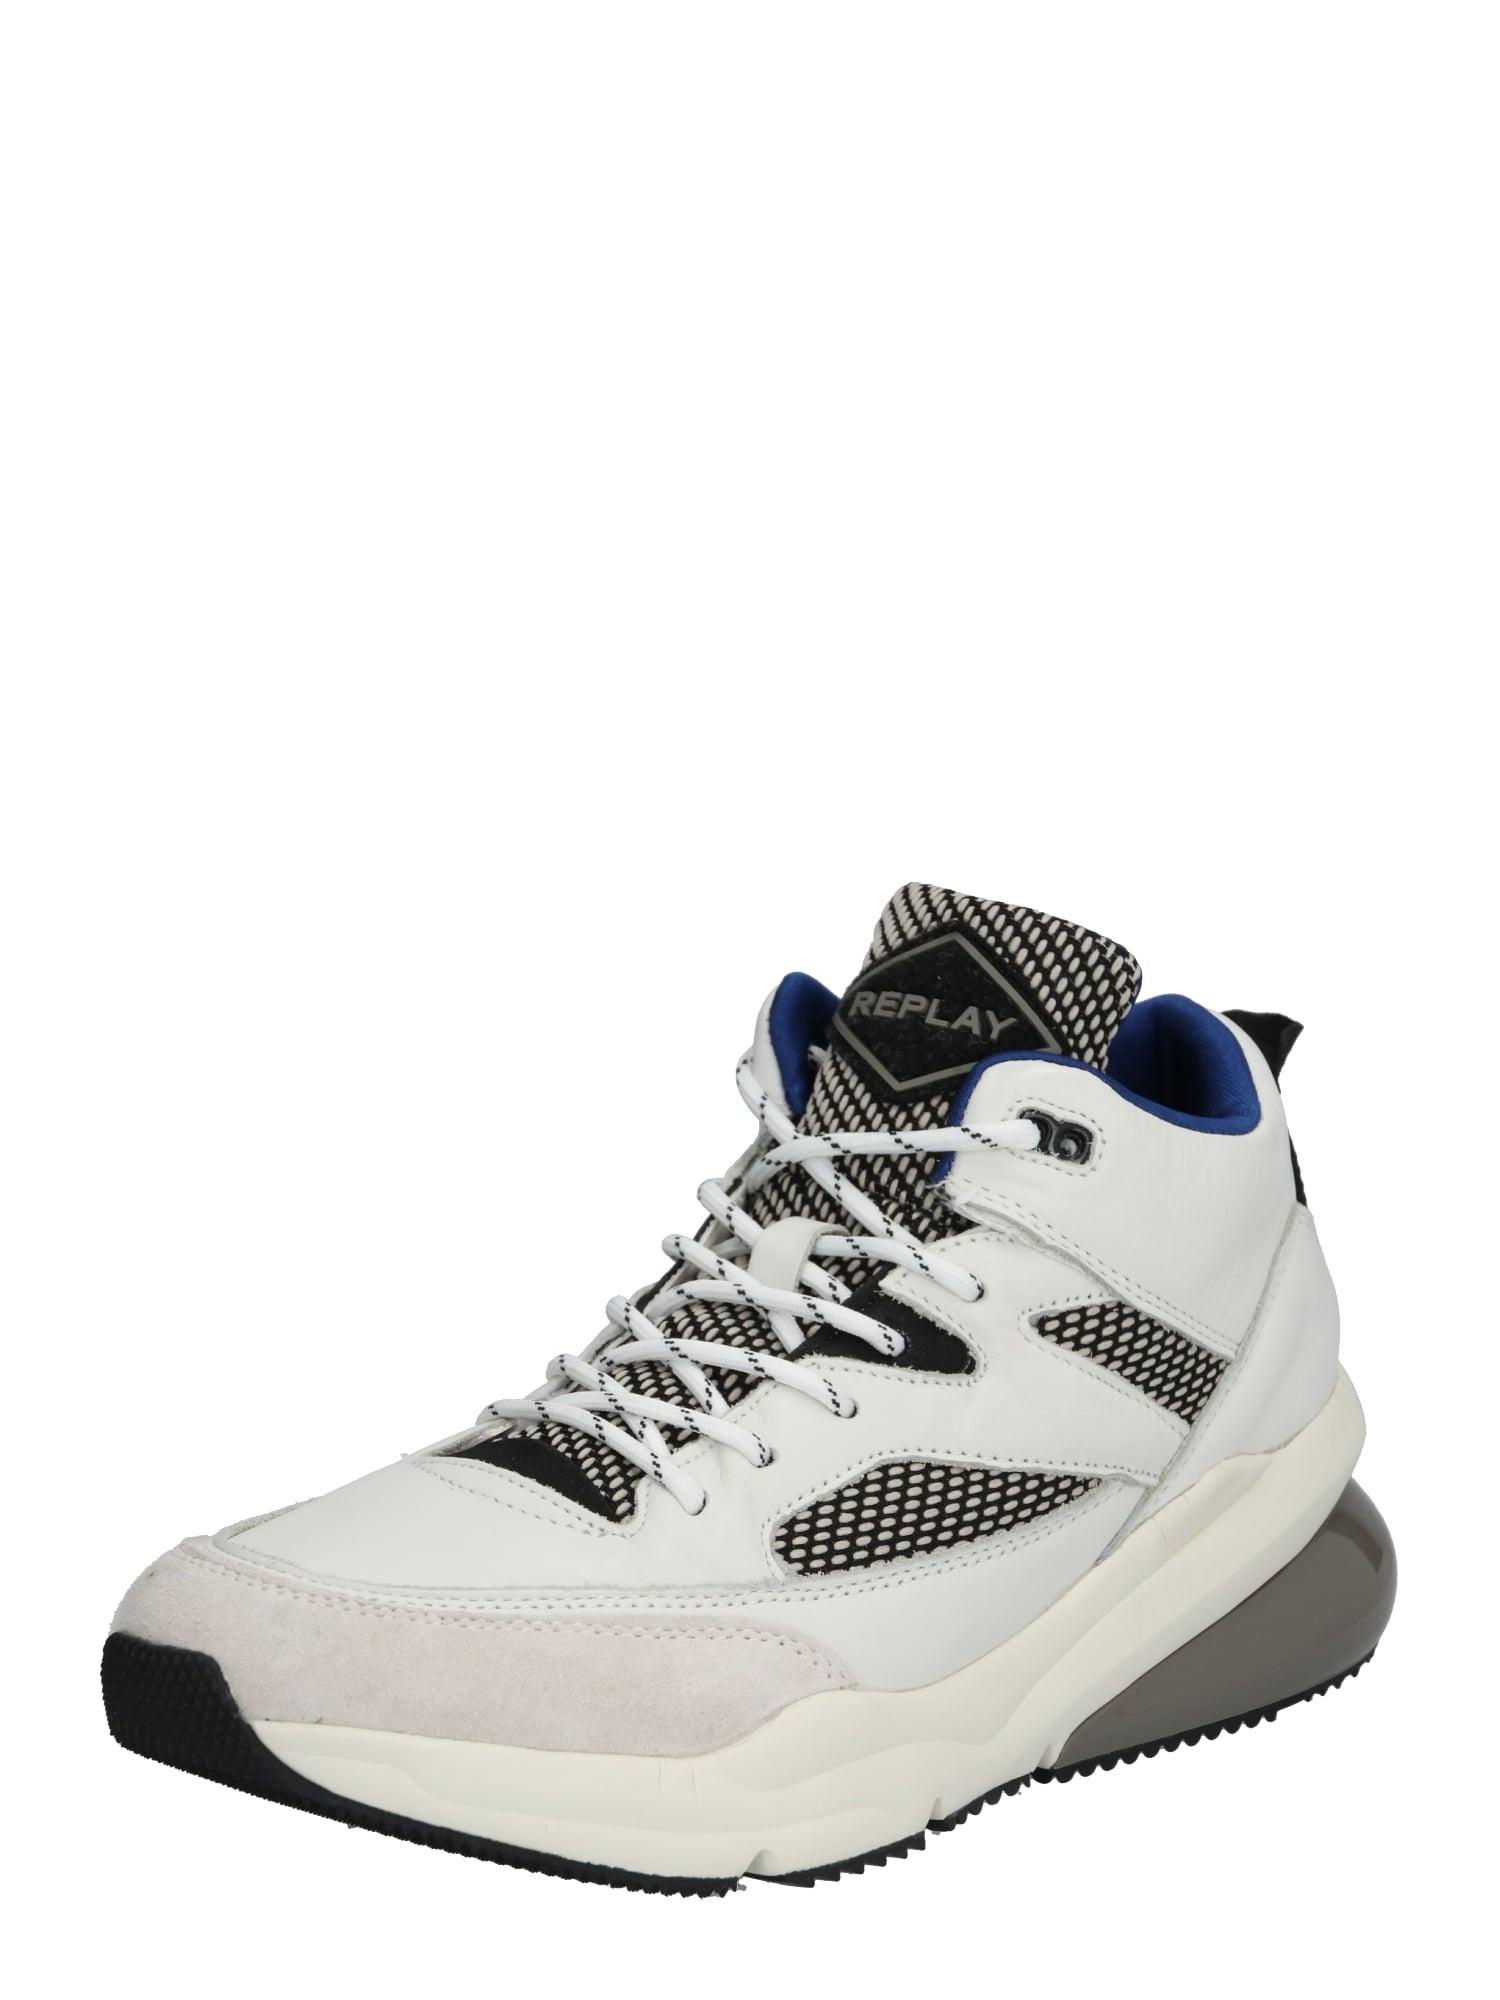 REPLAY Sneaker low 'HARDSTROW'  gri / offwhite